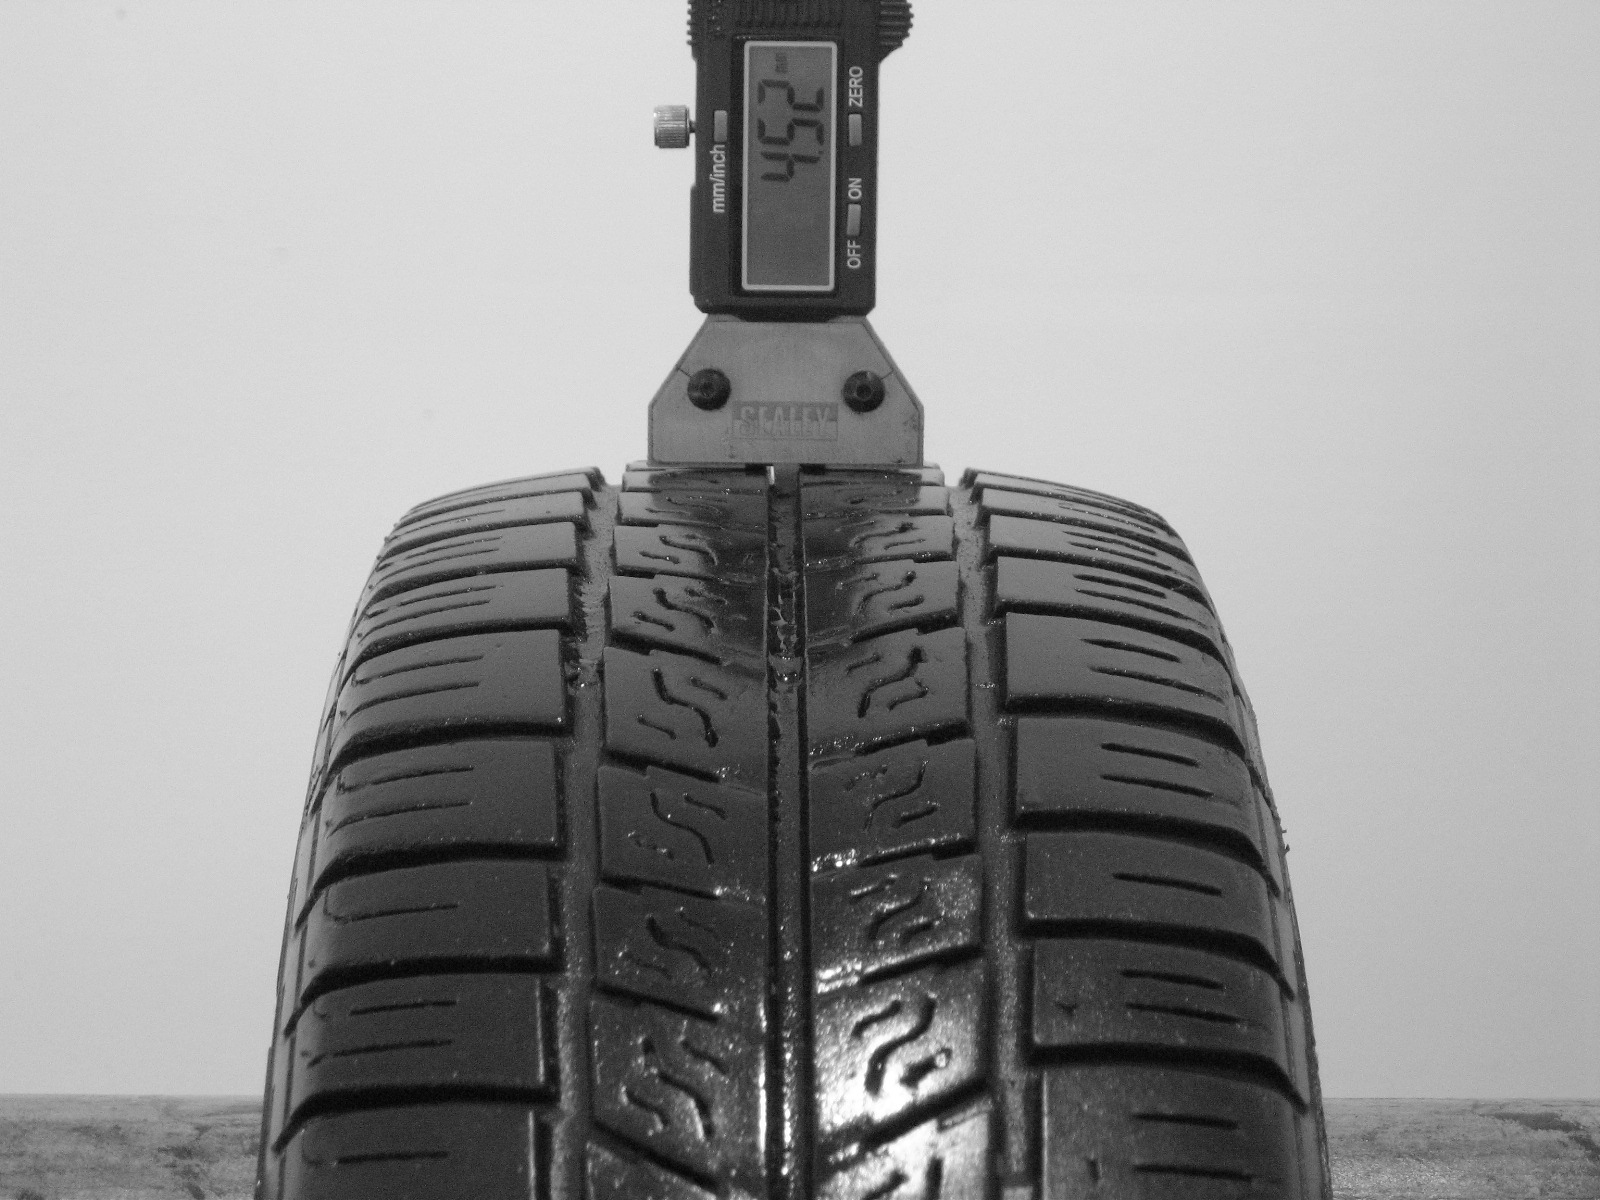 Použité-Pneu-Bazar - 155/70 R13 PIRELLI P2500 EURO -kusovka-rezerva 3mm